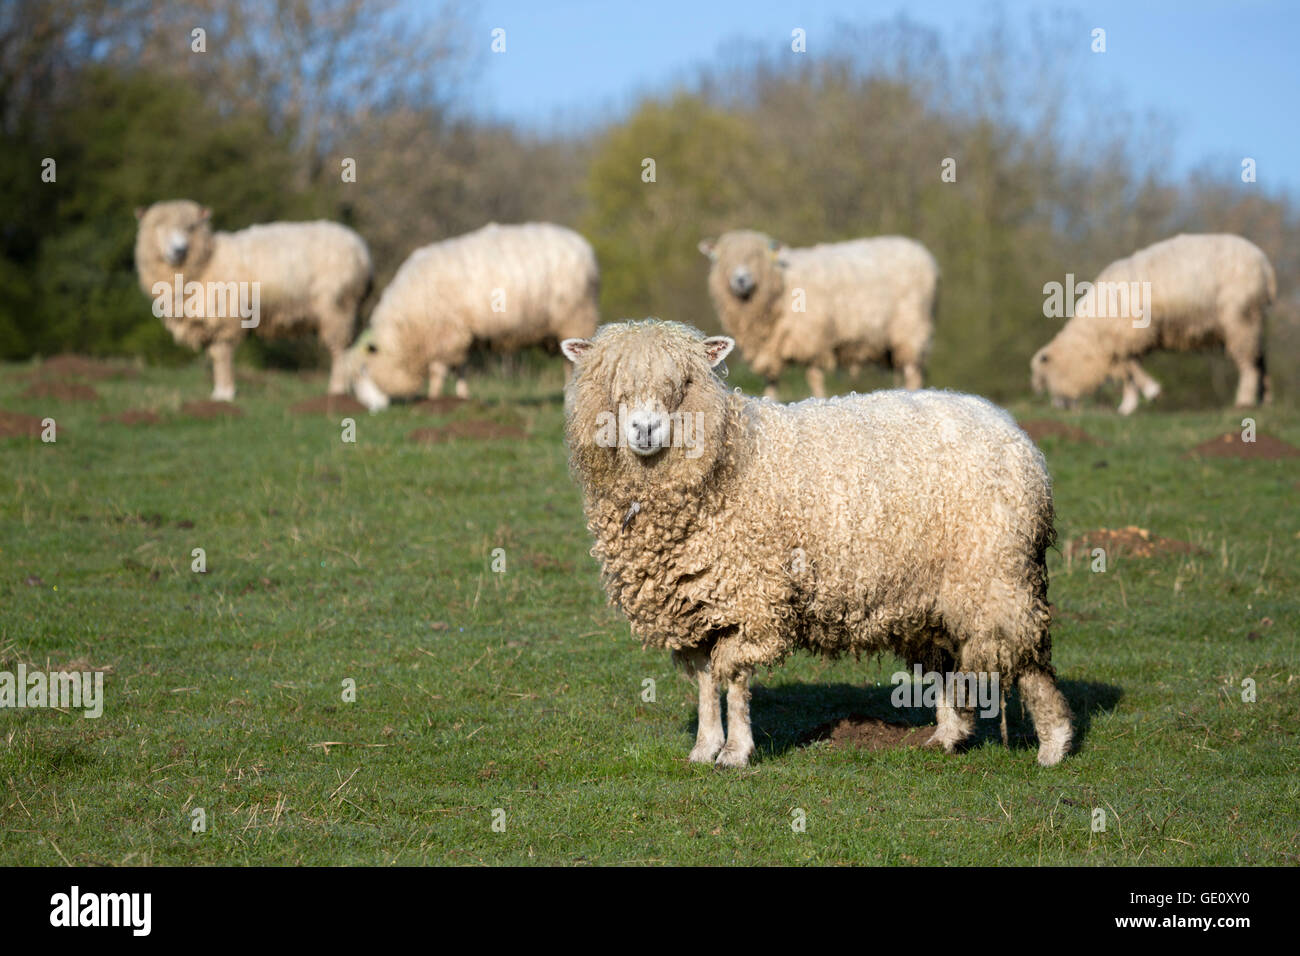 Cotswold Lion breed of sheep, Cotswolds, Gloucestershire, England, United Kingdom, Europe - Stock Image